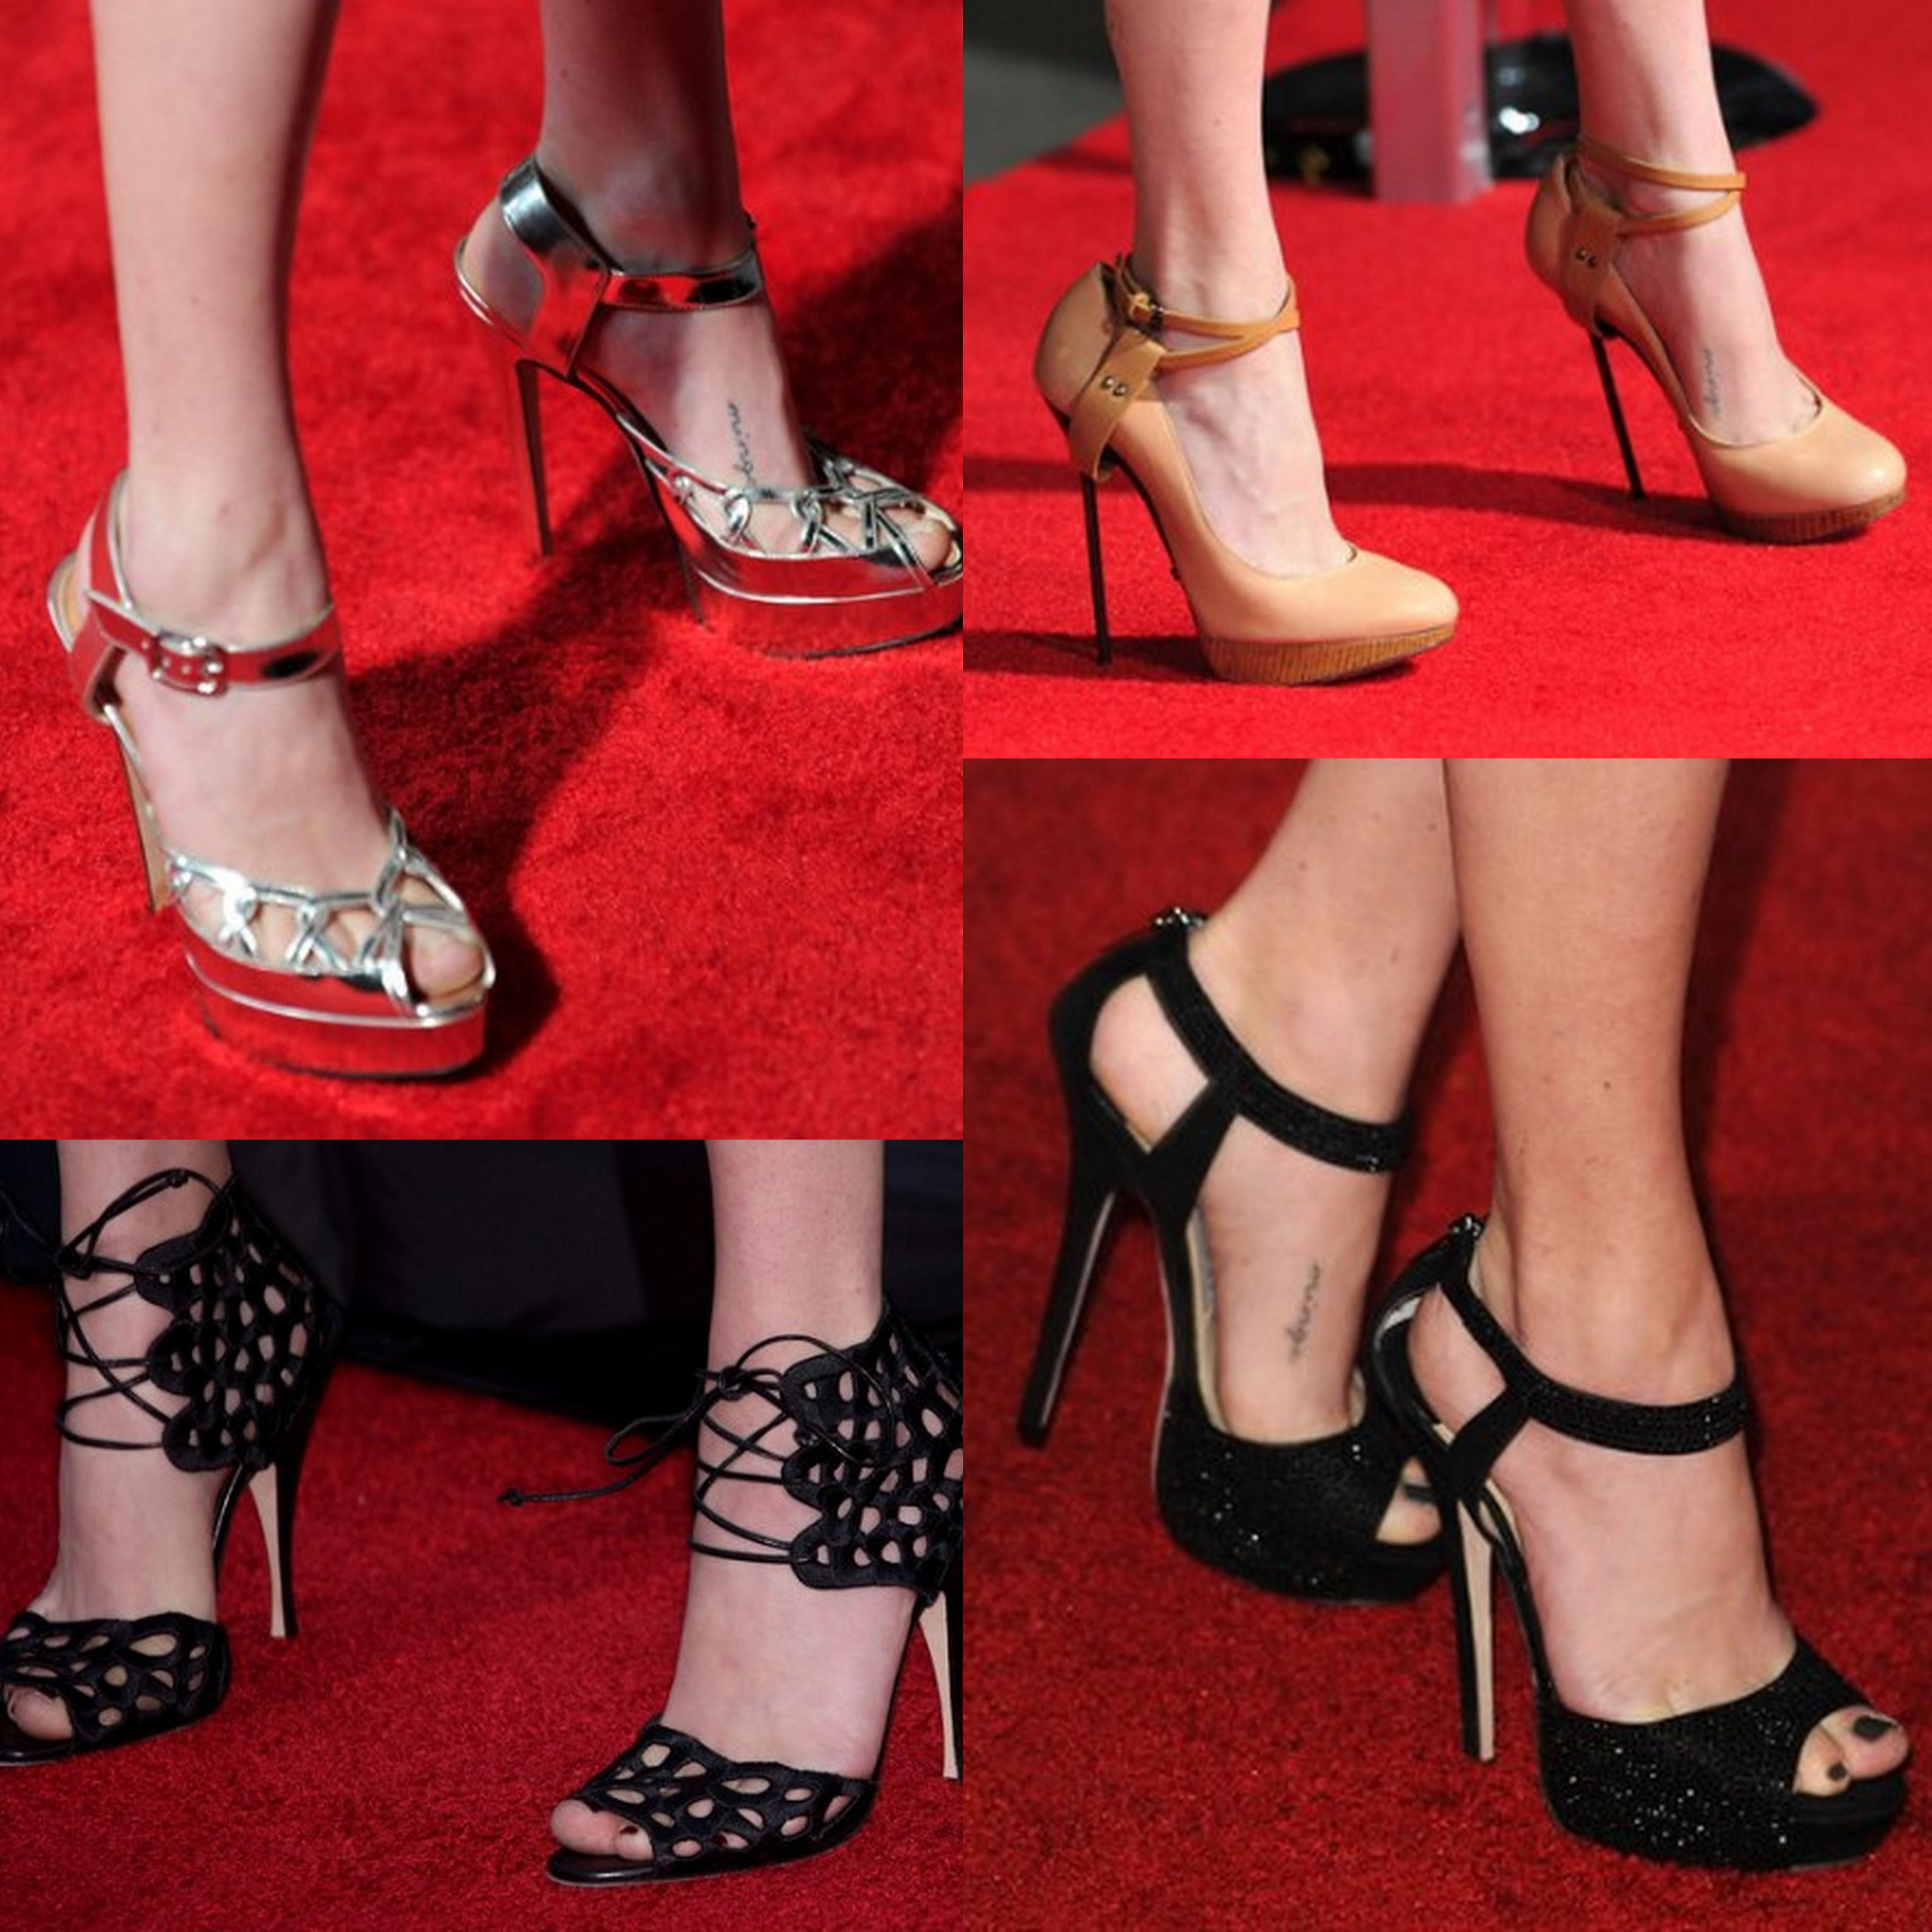 Amanda seyfried nude heels